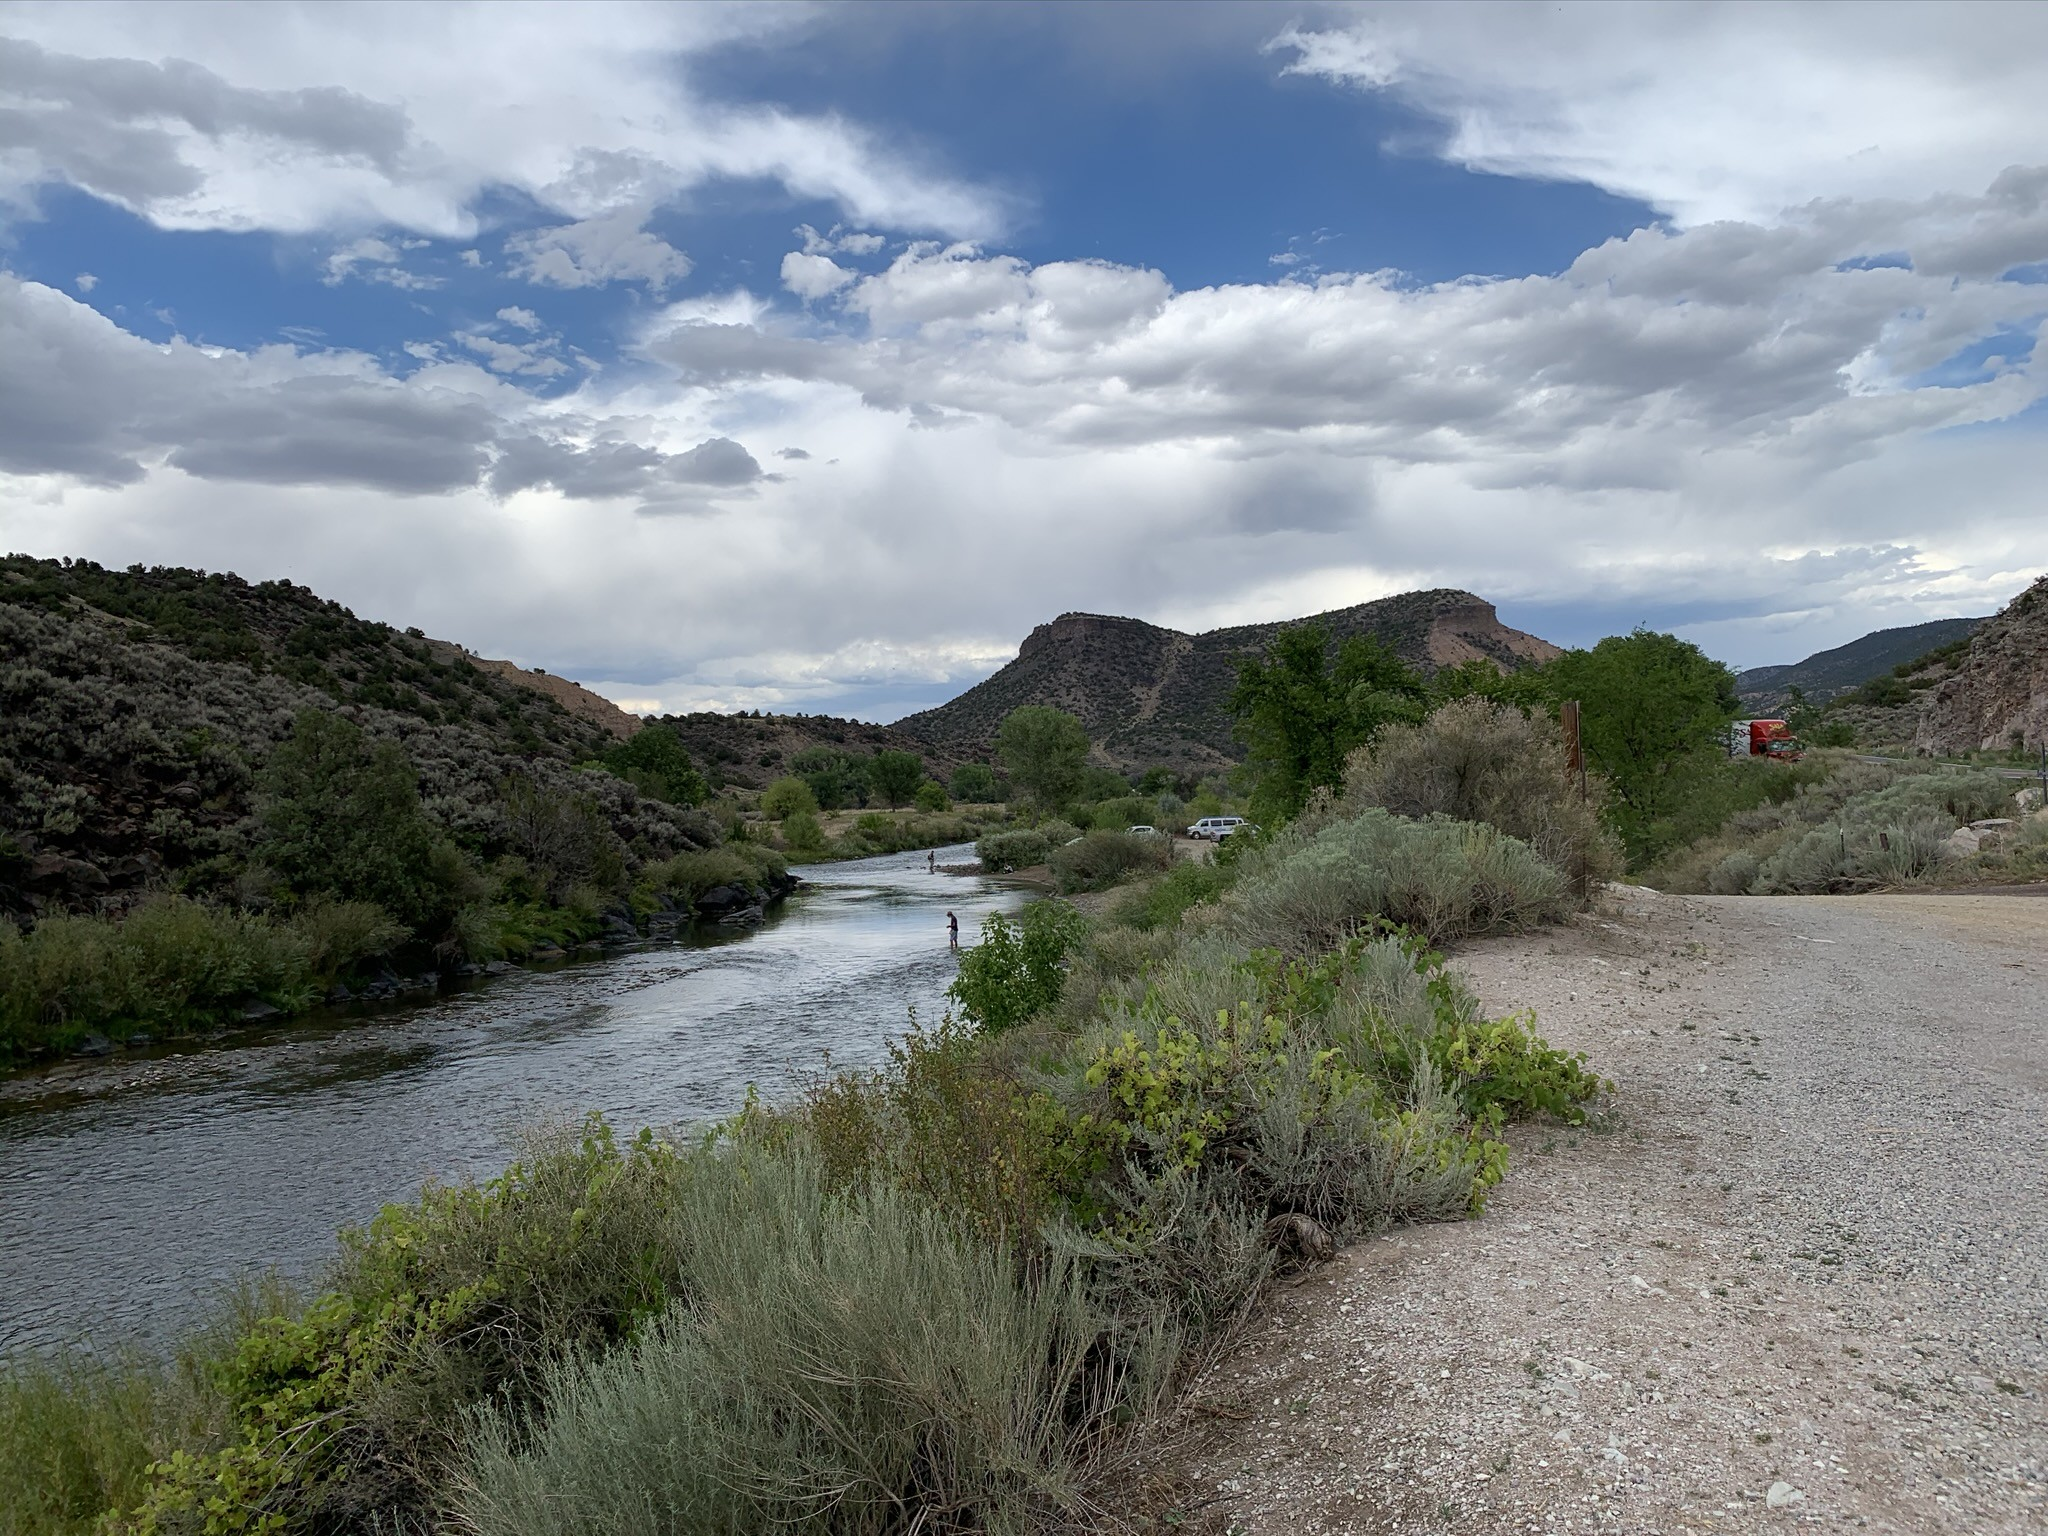 Rio Grande River between Santa Fe and Taos, New Mexico